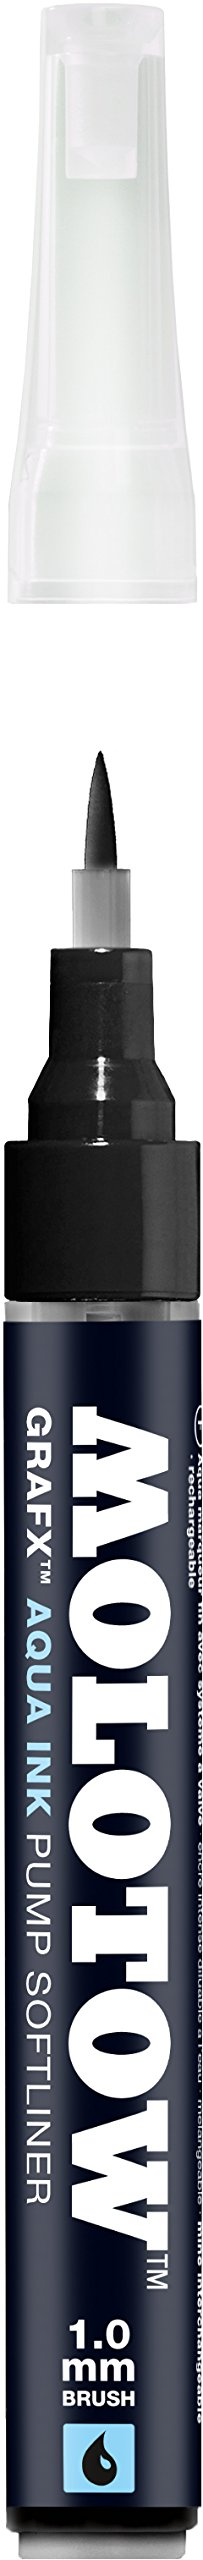 Molotow GRAFX Aqua Ink Soft Liner Brush Pump Marker, Deep...